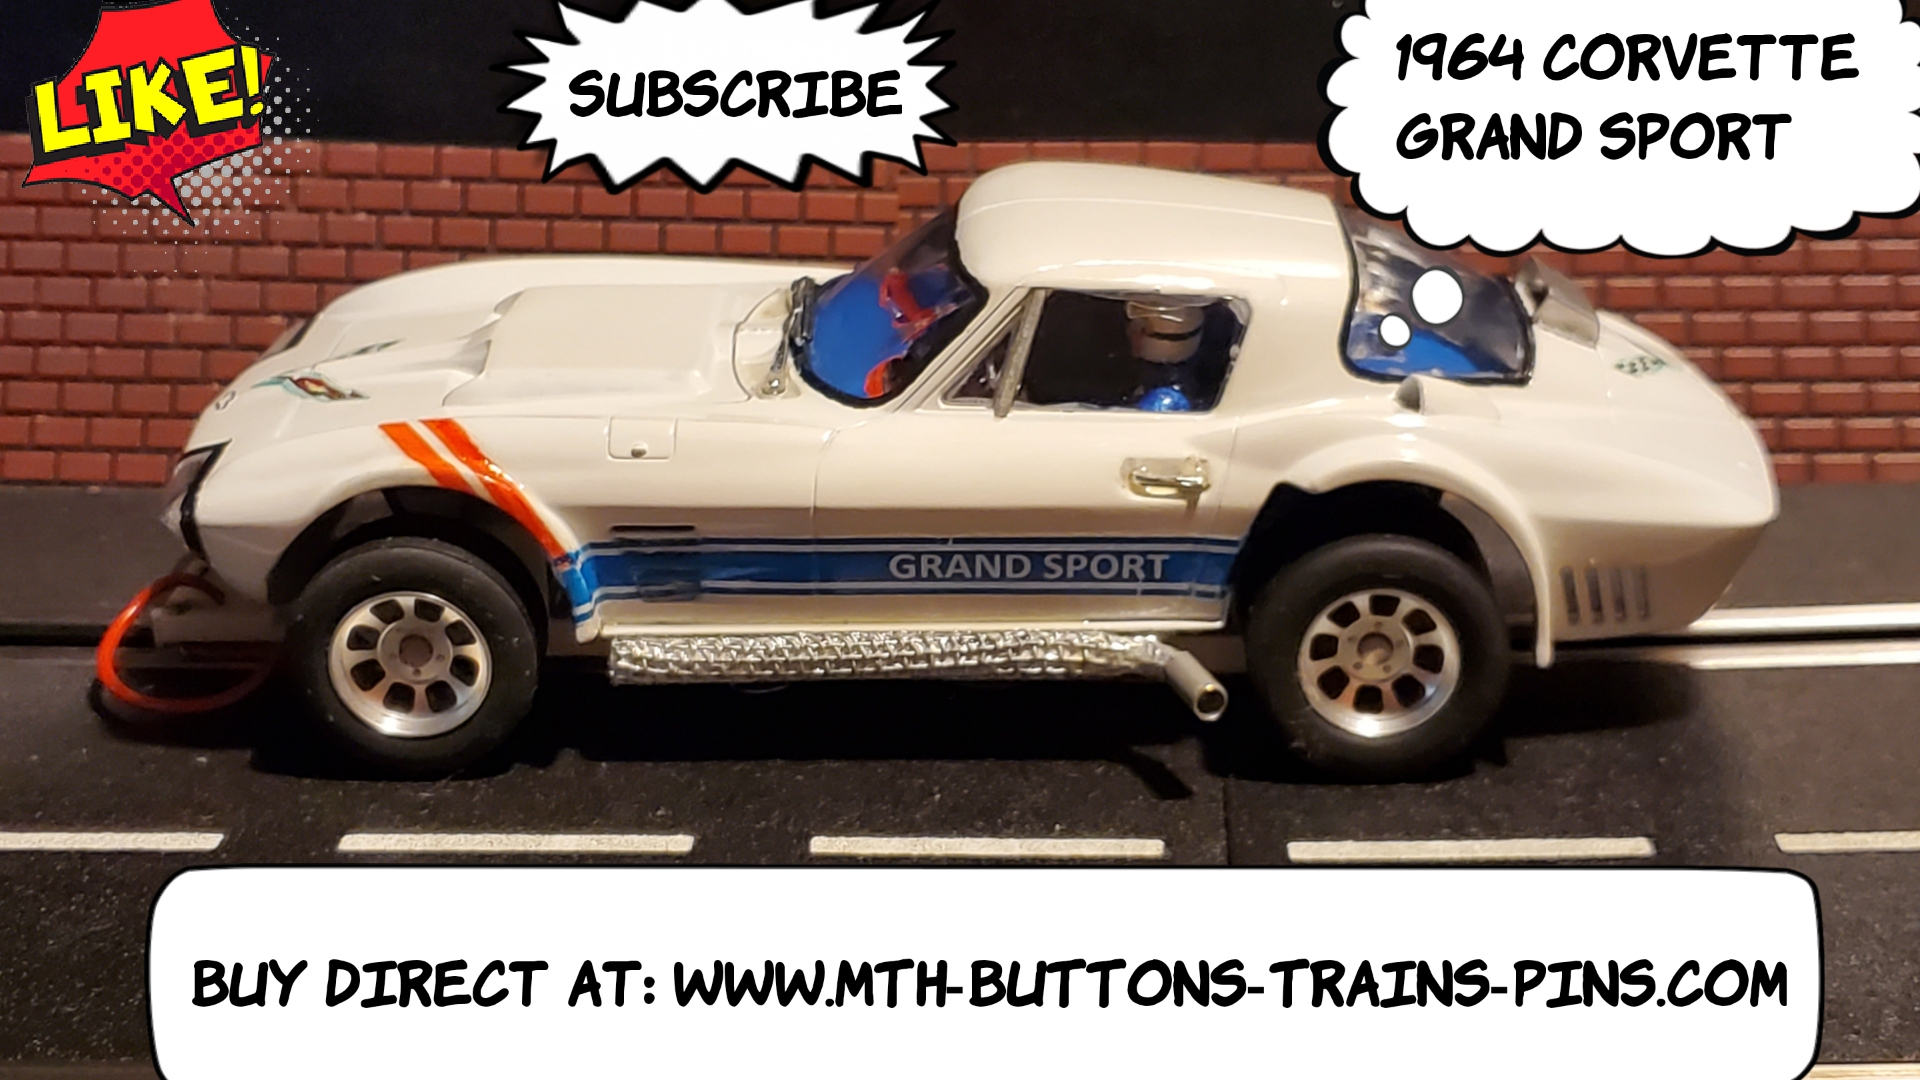 * Super September SALE * Vintage 1964 Corvette Grand Sport C2 in Ermine White Slot Car 1/24 scale